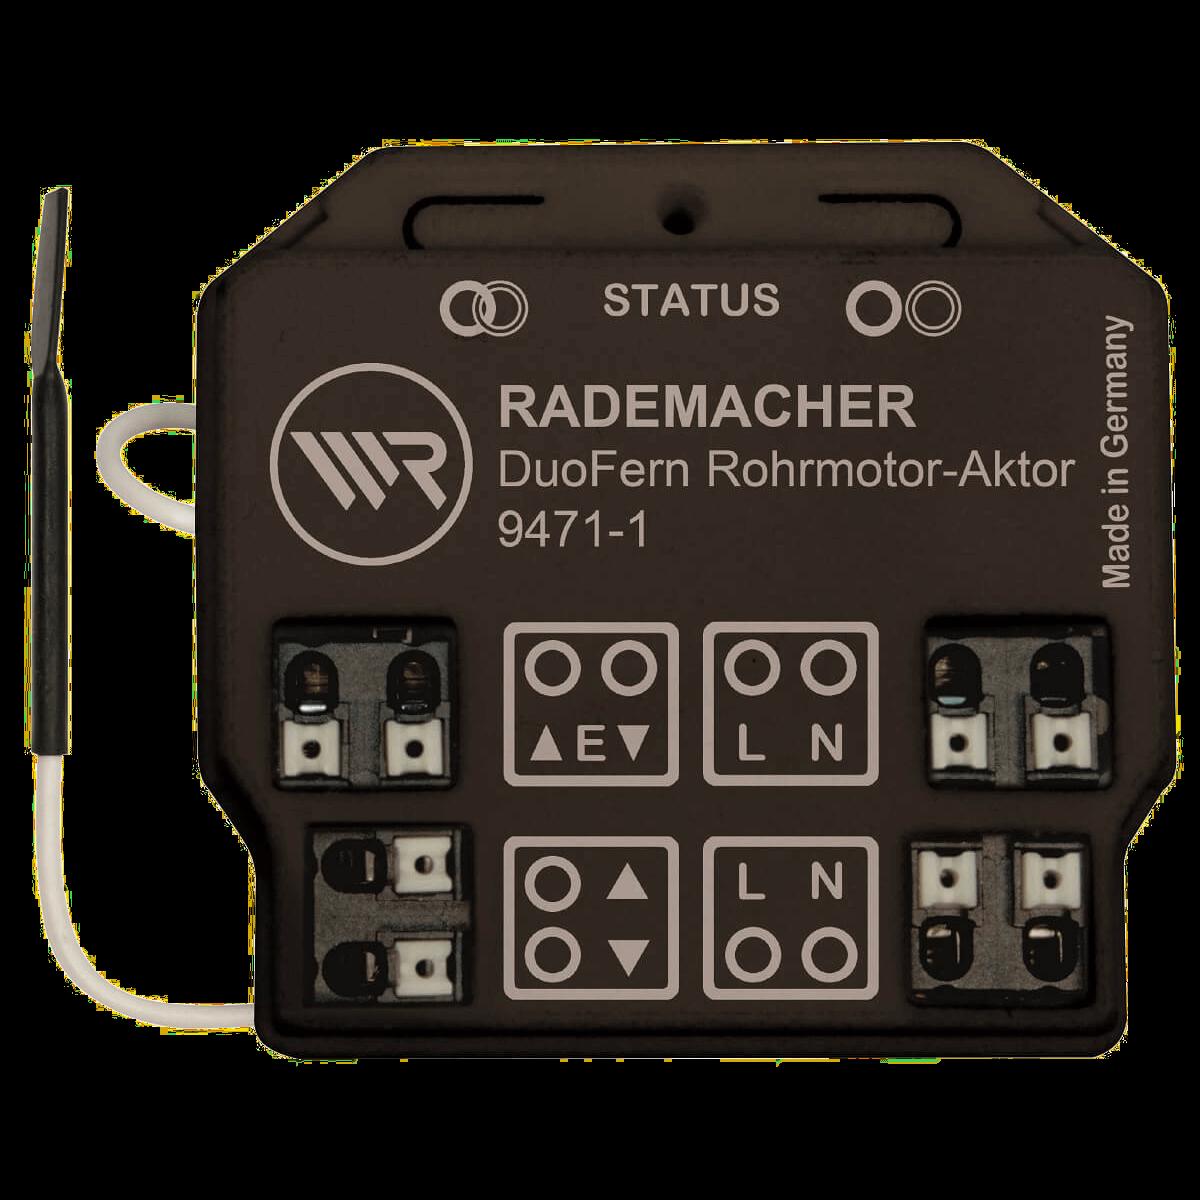 Rademacher Rohrmotor-Aktor Unterputz DuoFern